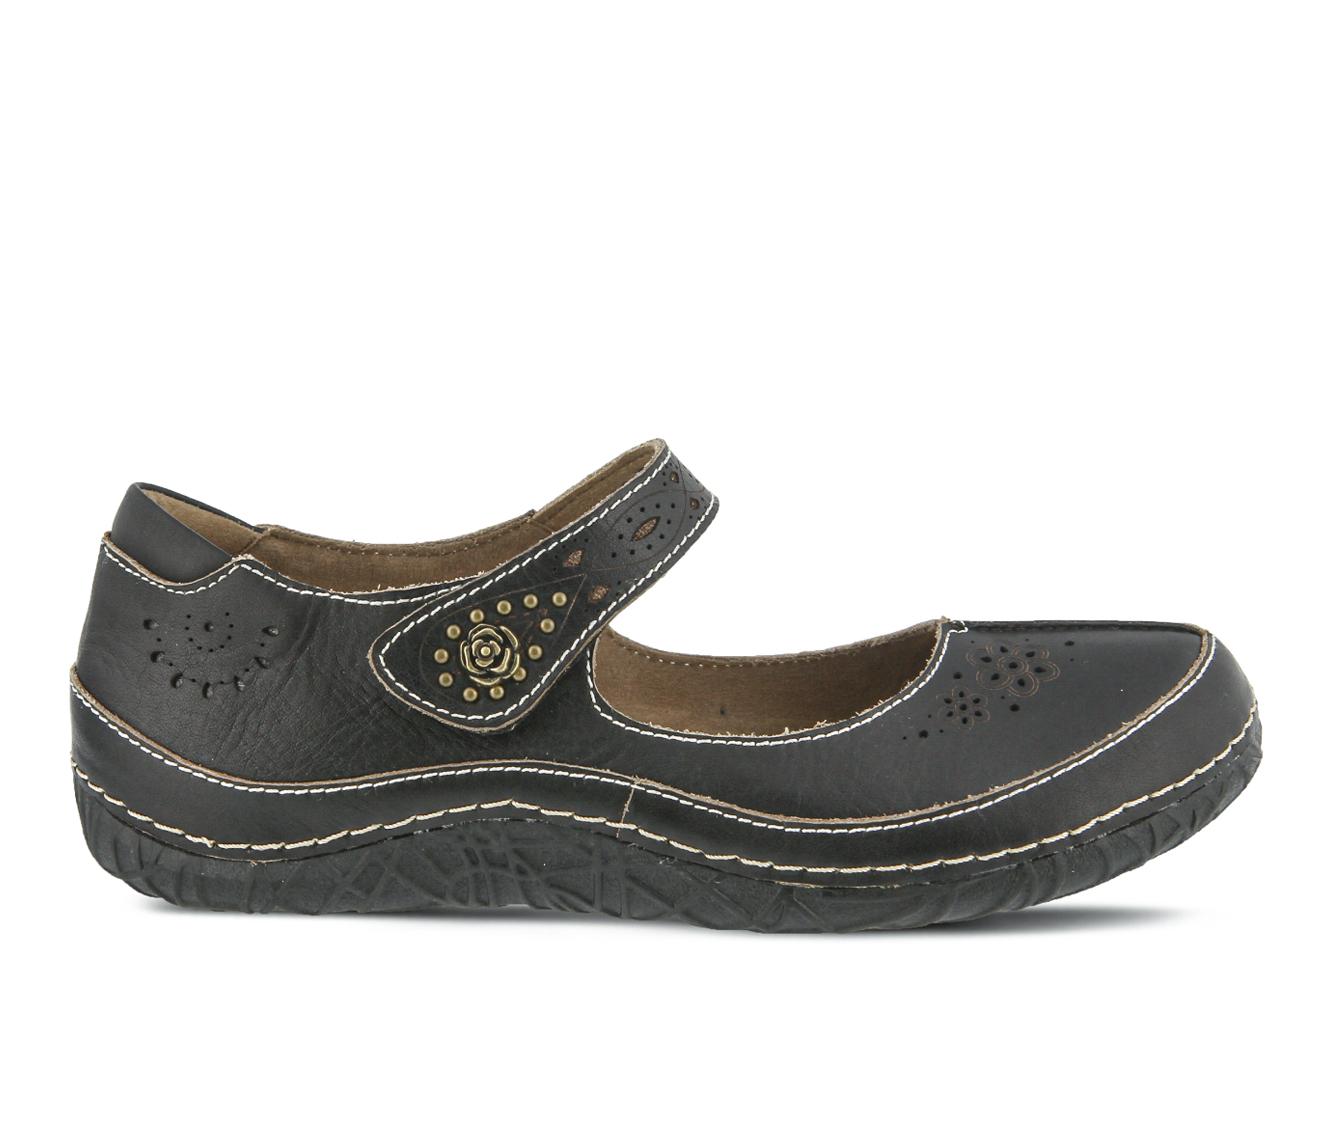 L'Artiste Lazarina Women's Shoe (Black Leather)